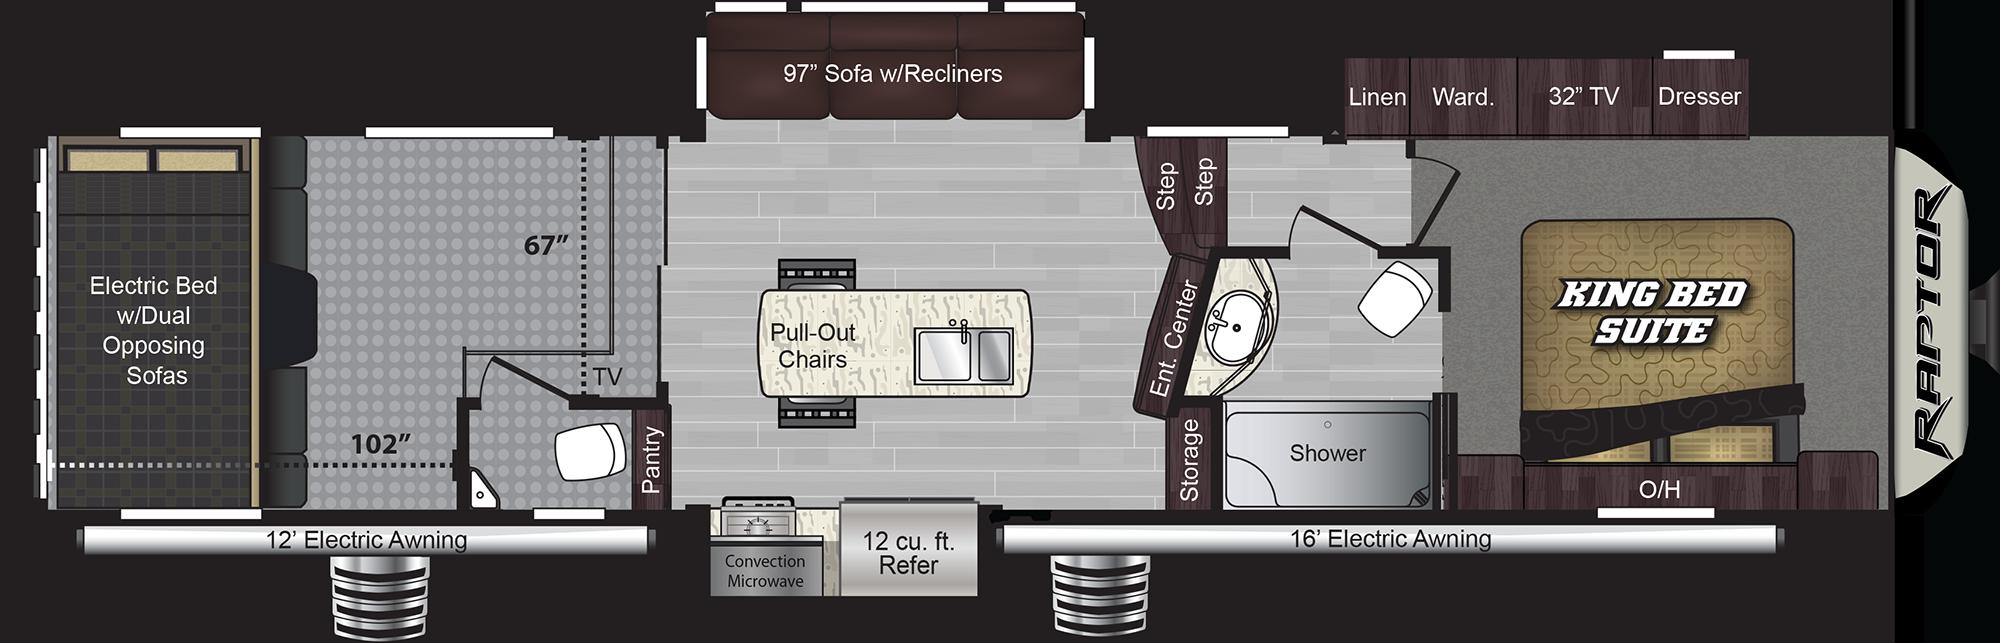 353TS Floorplan